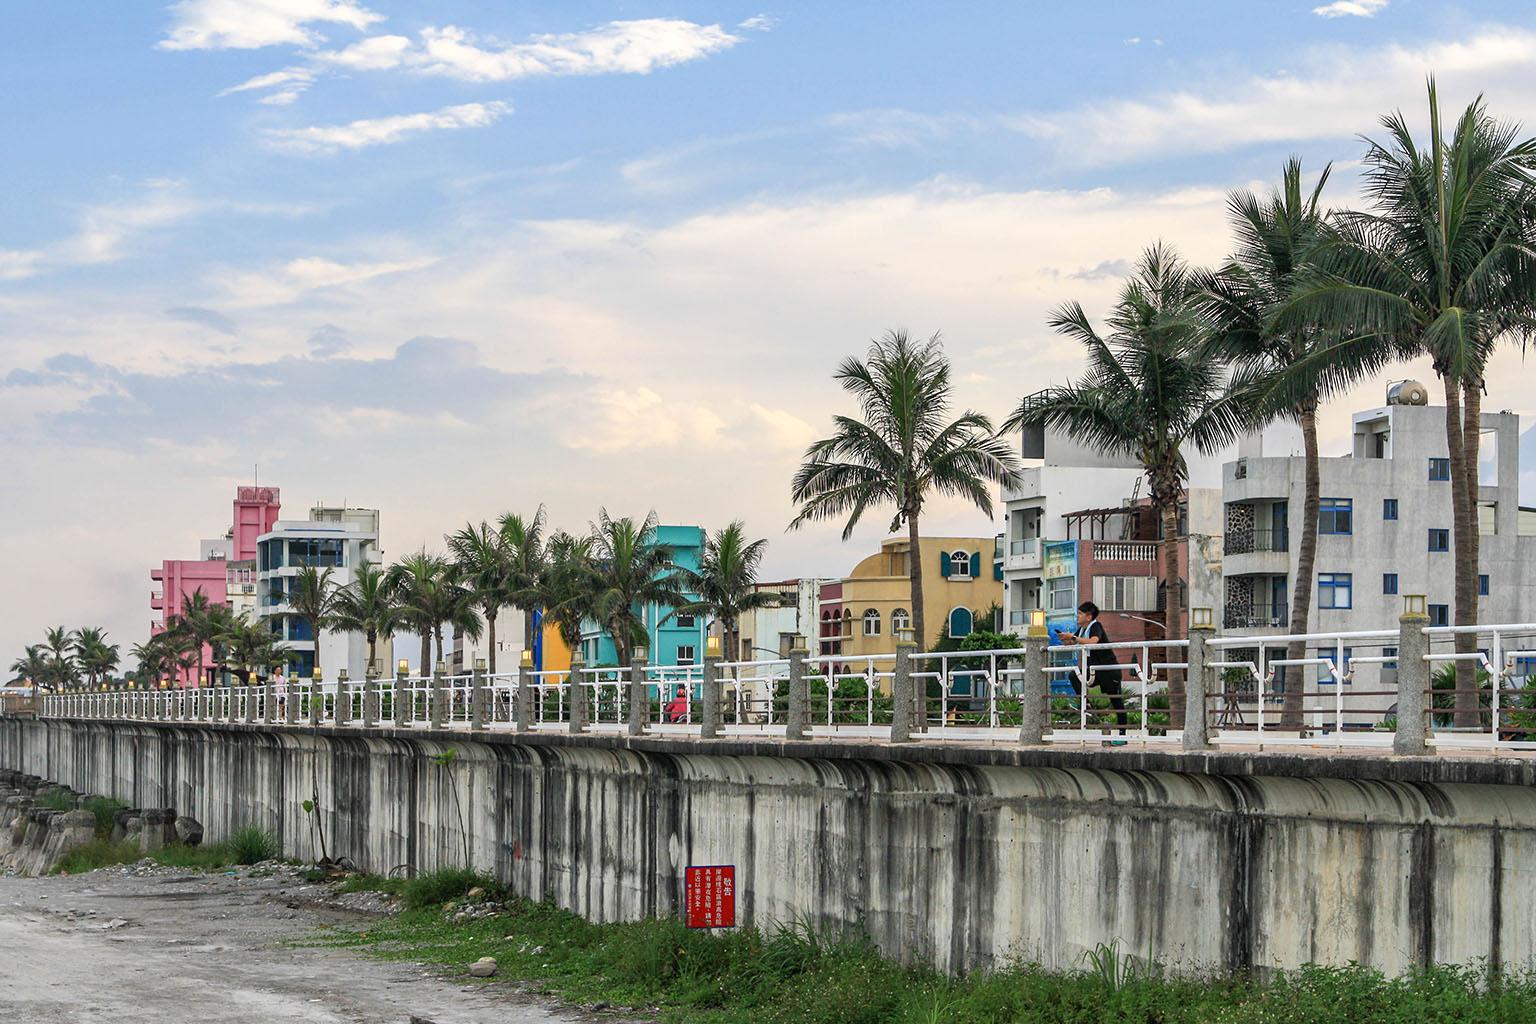 Coastal Hualien; a bike/walking path runs along the entire coastal border of the city.